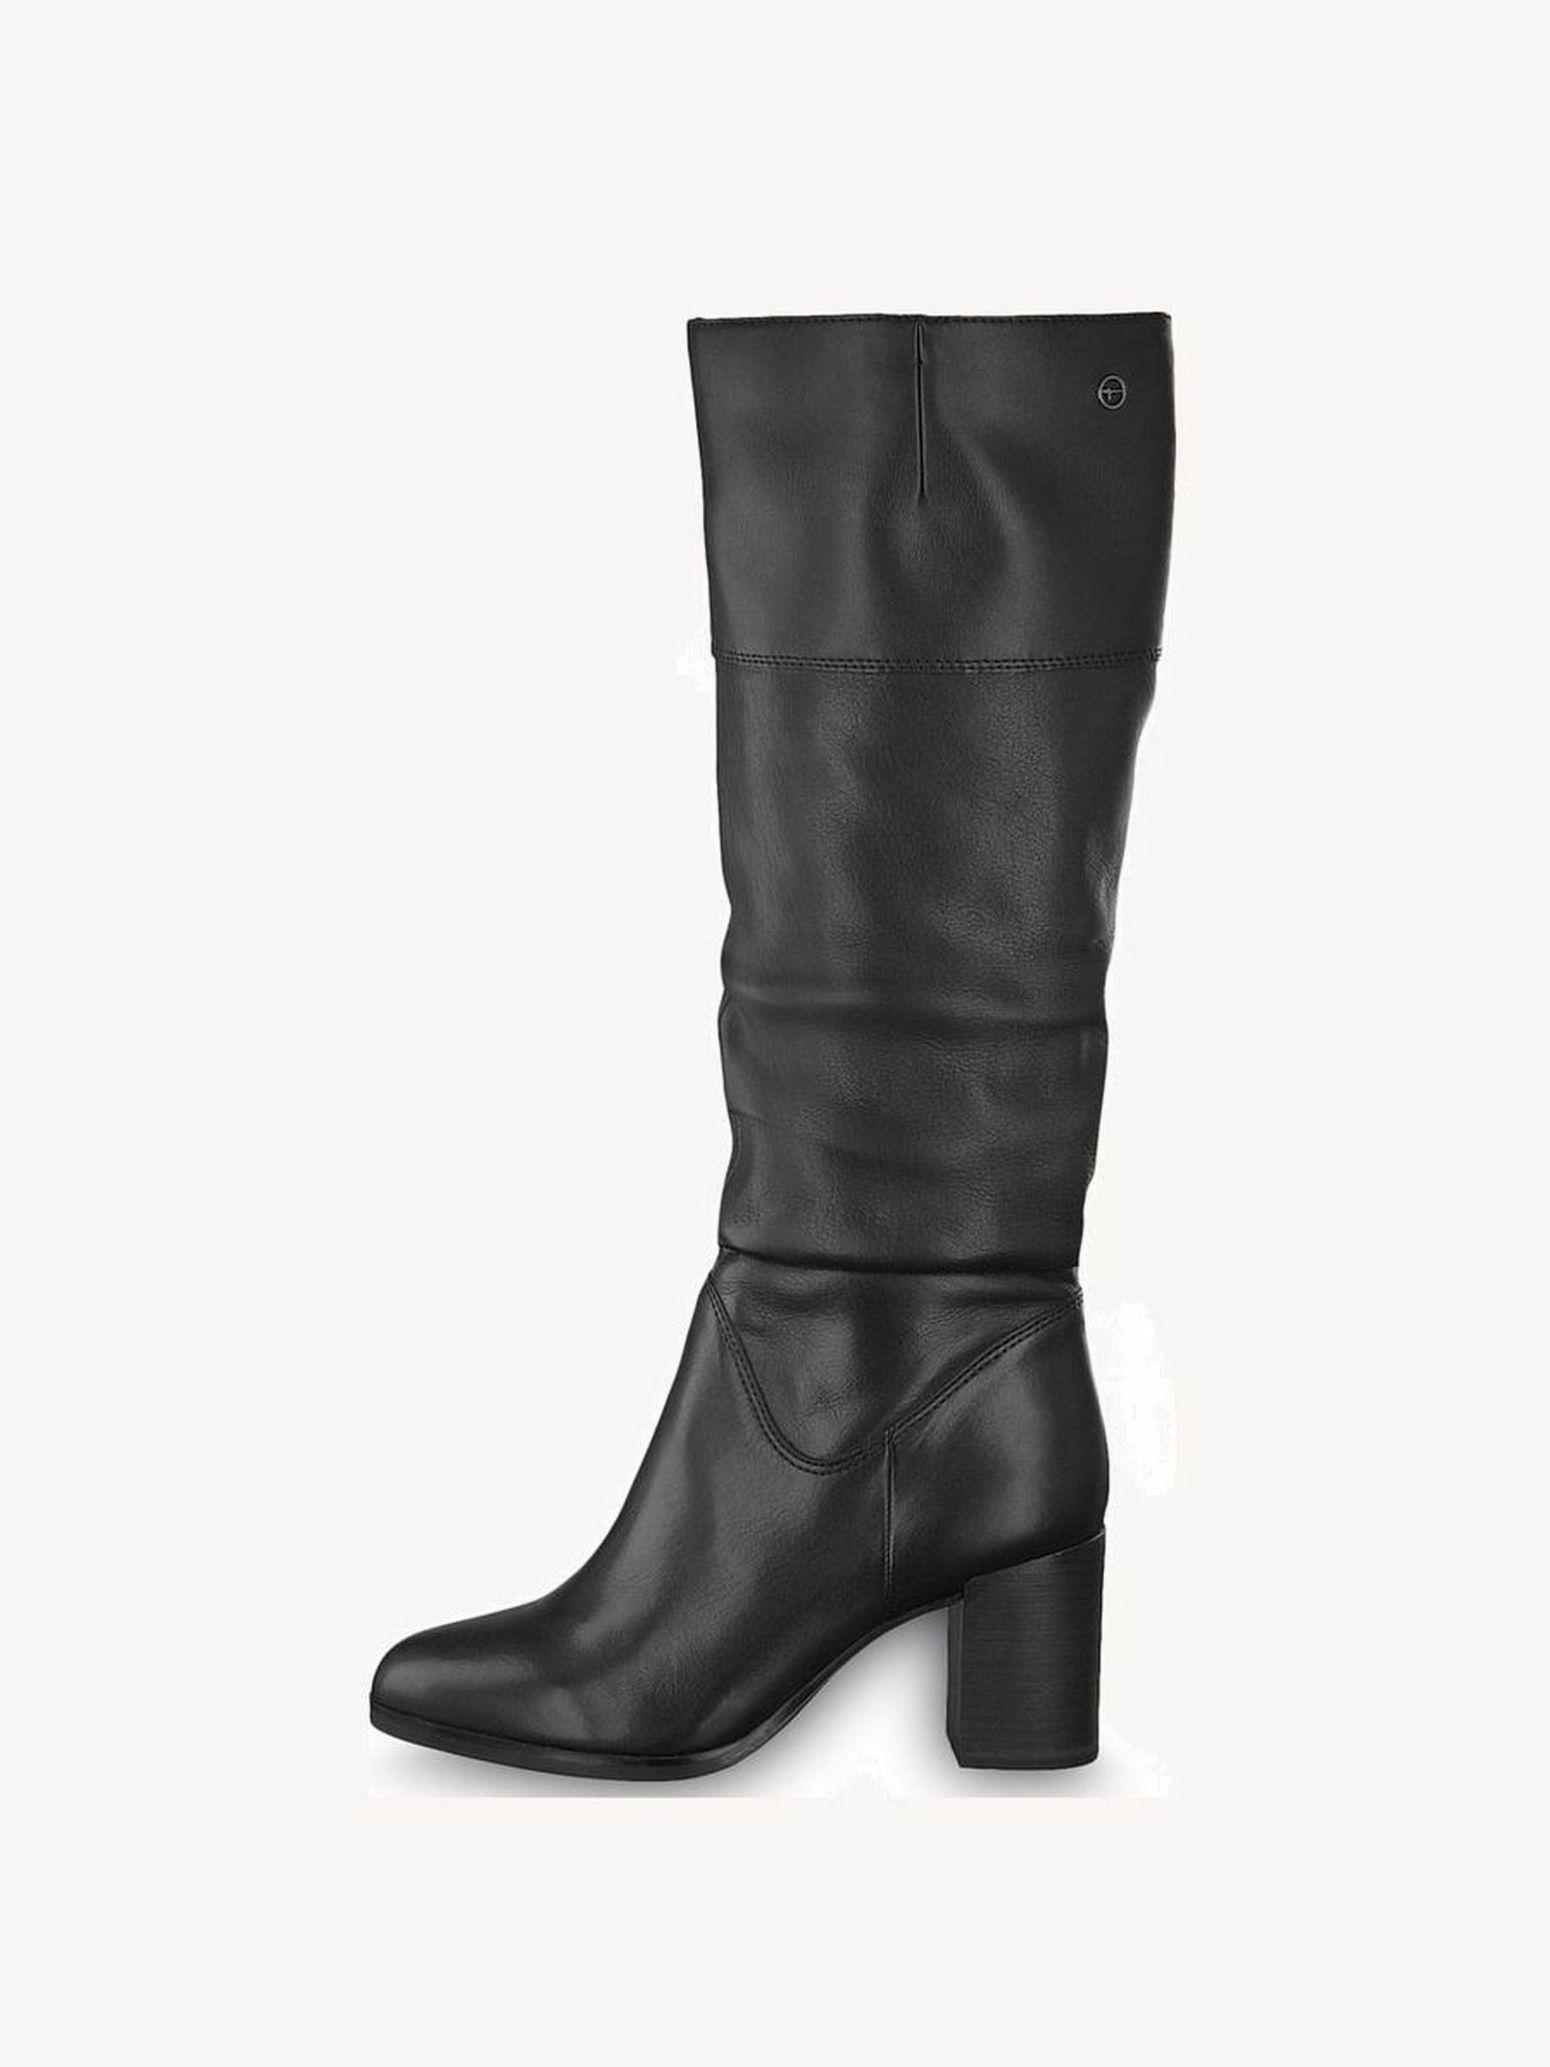 da0939c1ace Leather Boots